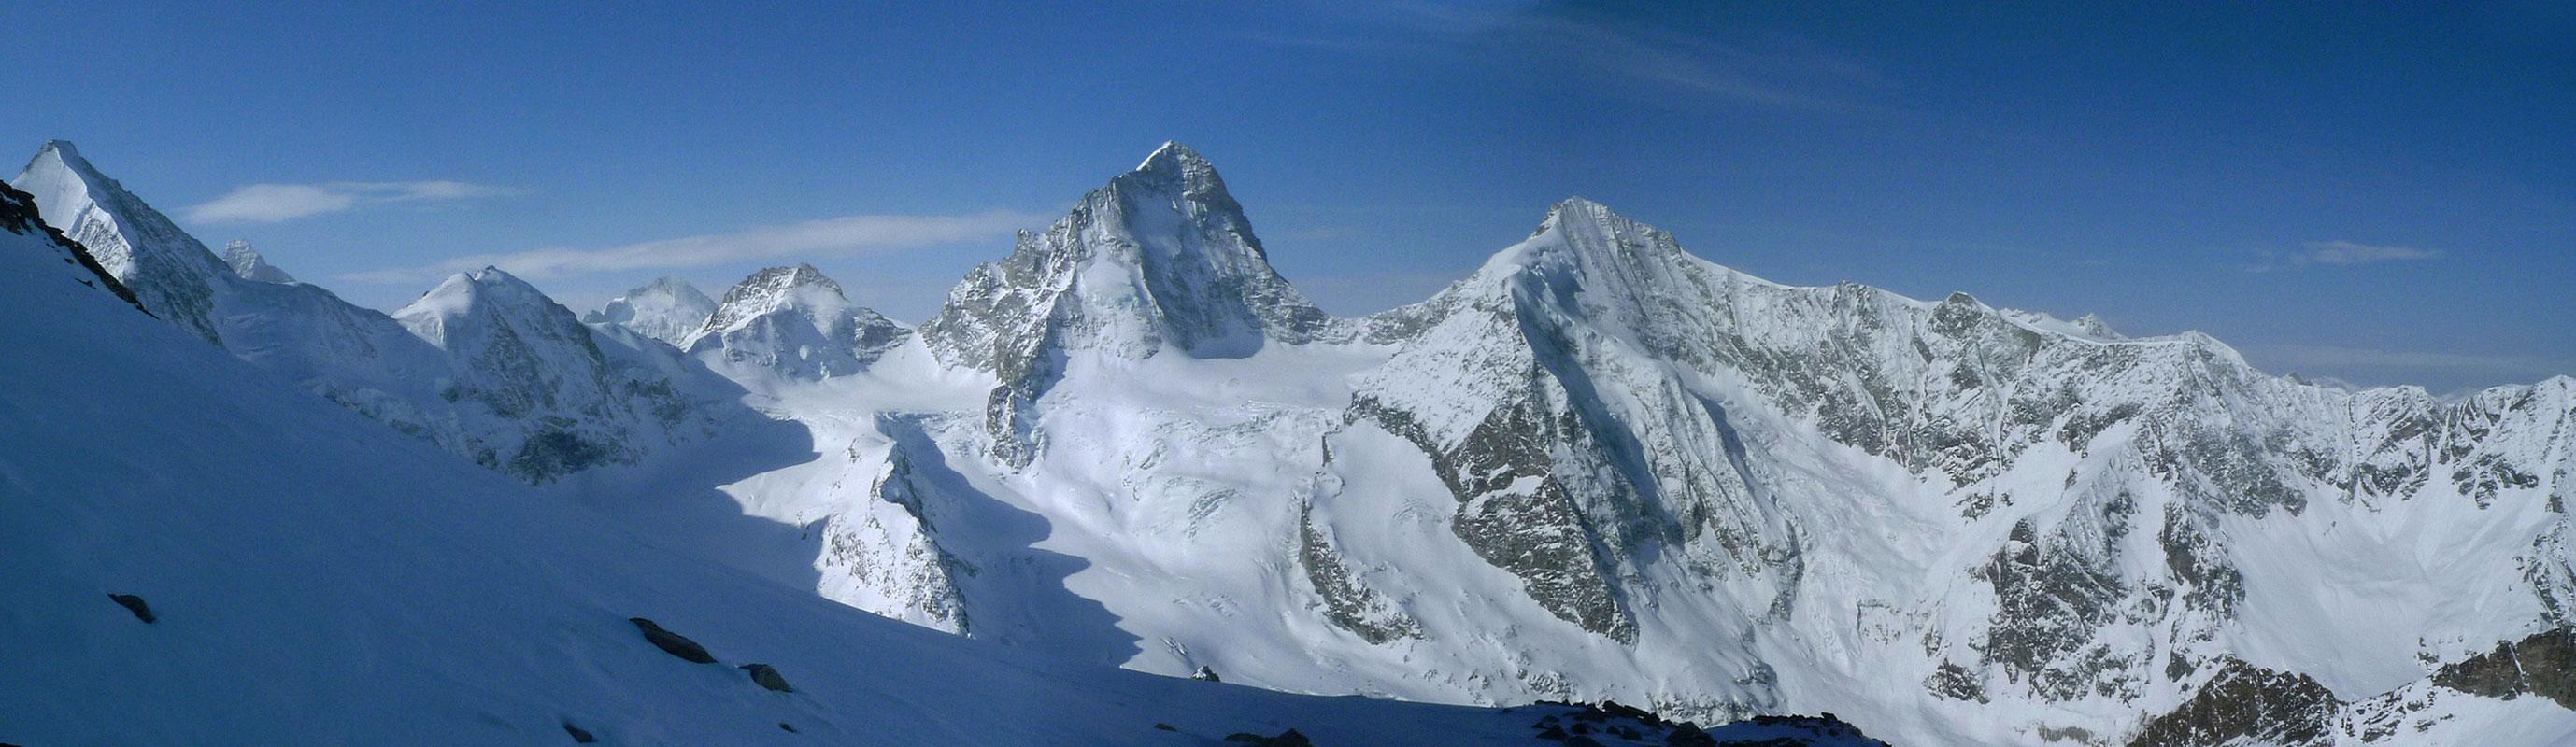 Blanc de Moming - Dôme Circuit Walliser Alpen / Alpes valaisannes Switzerland panorama 36